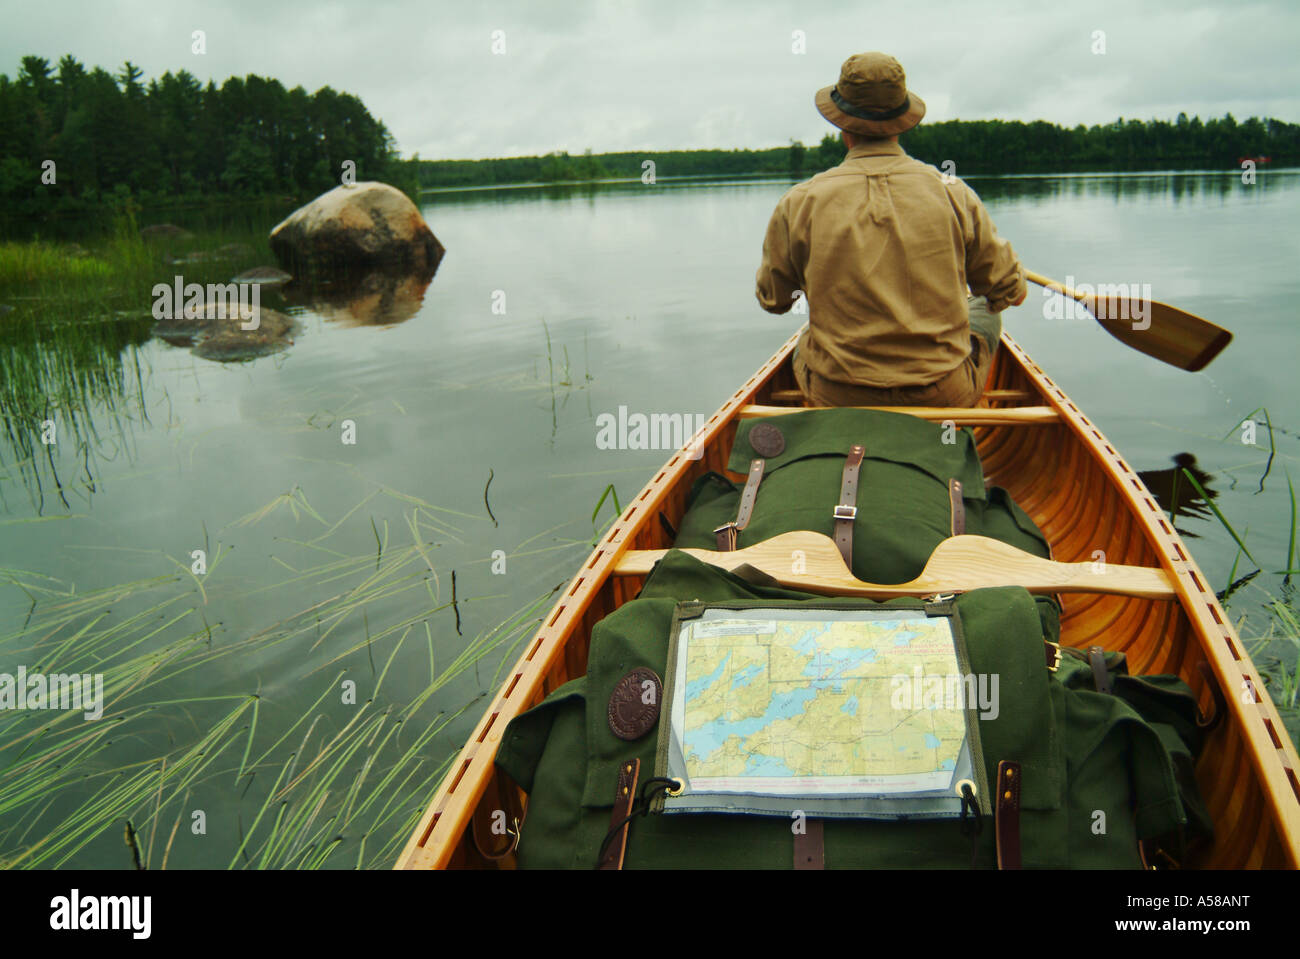 Paddling a canoe in Boundary Waters Canoe Area Wilderness BWCAW Minnesota - Stock Image